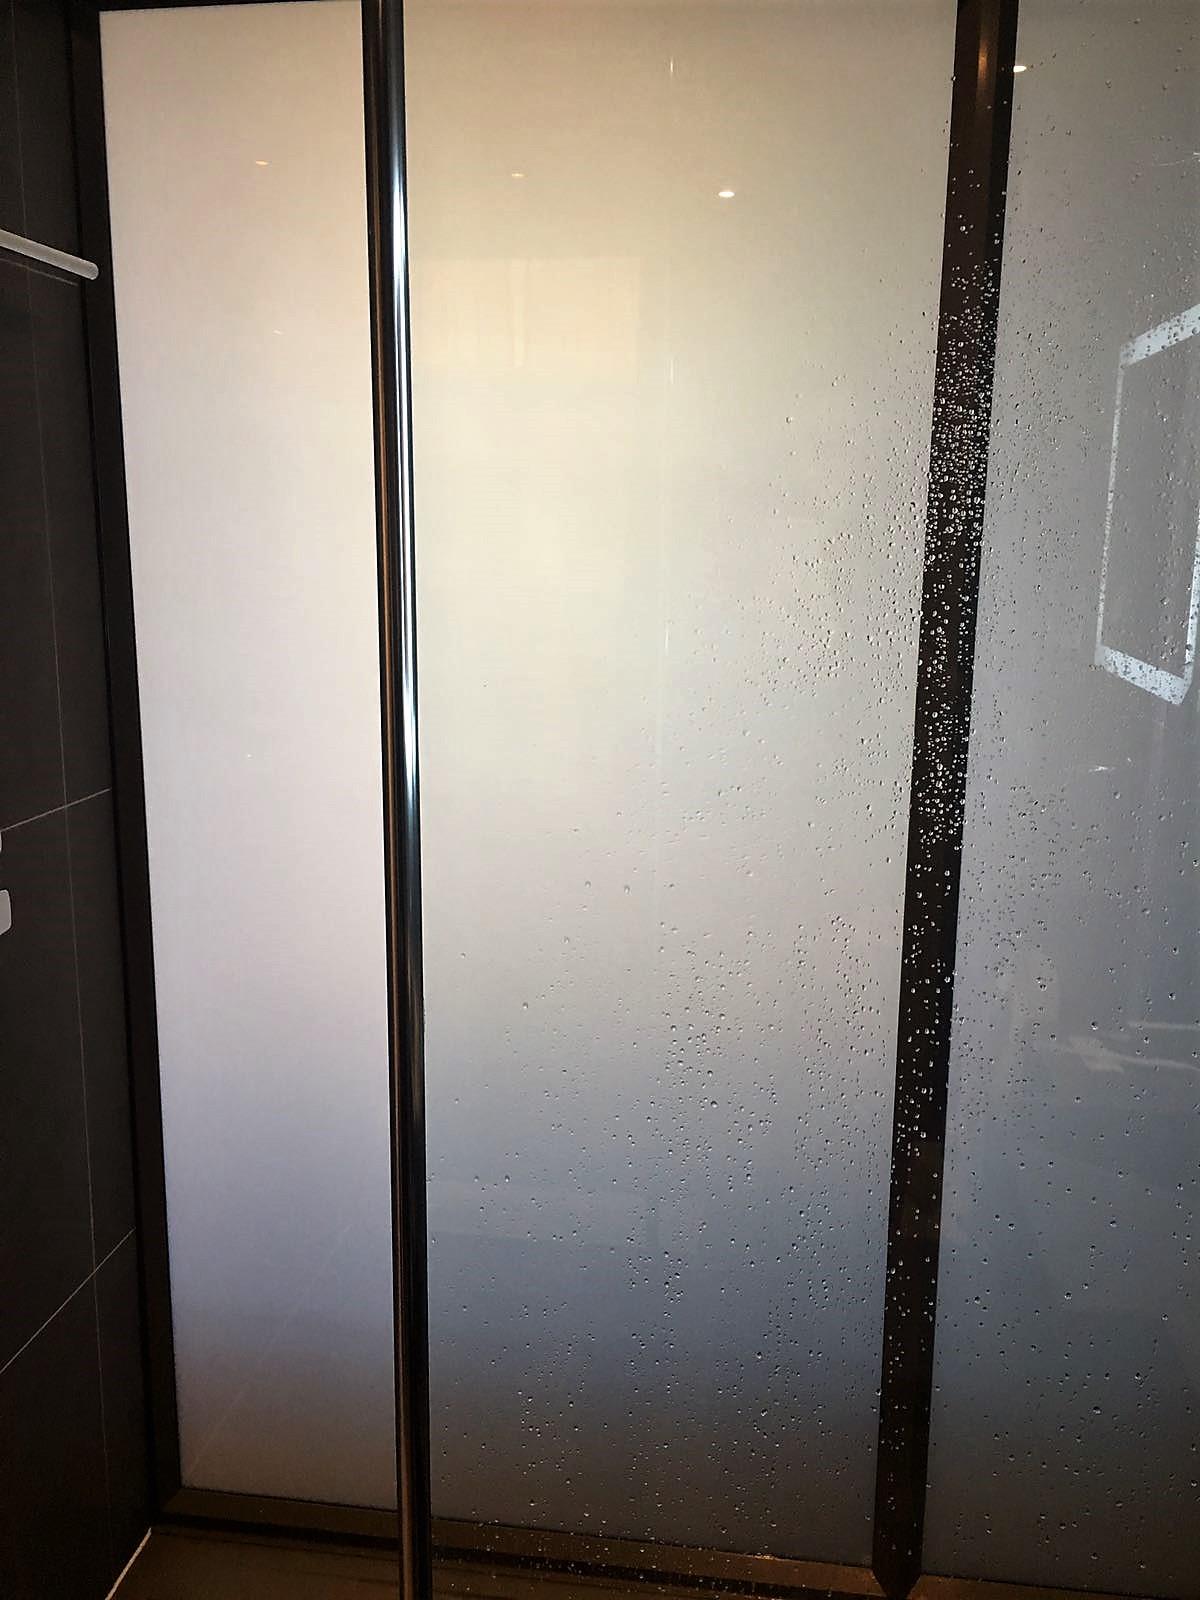 Novotel Heathrow Terminal 1,2,3 review shower door frosted